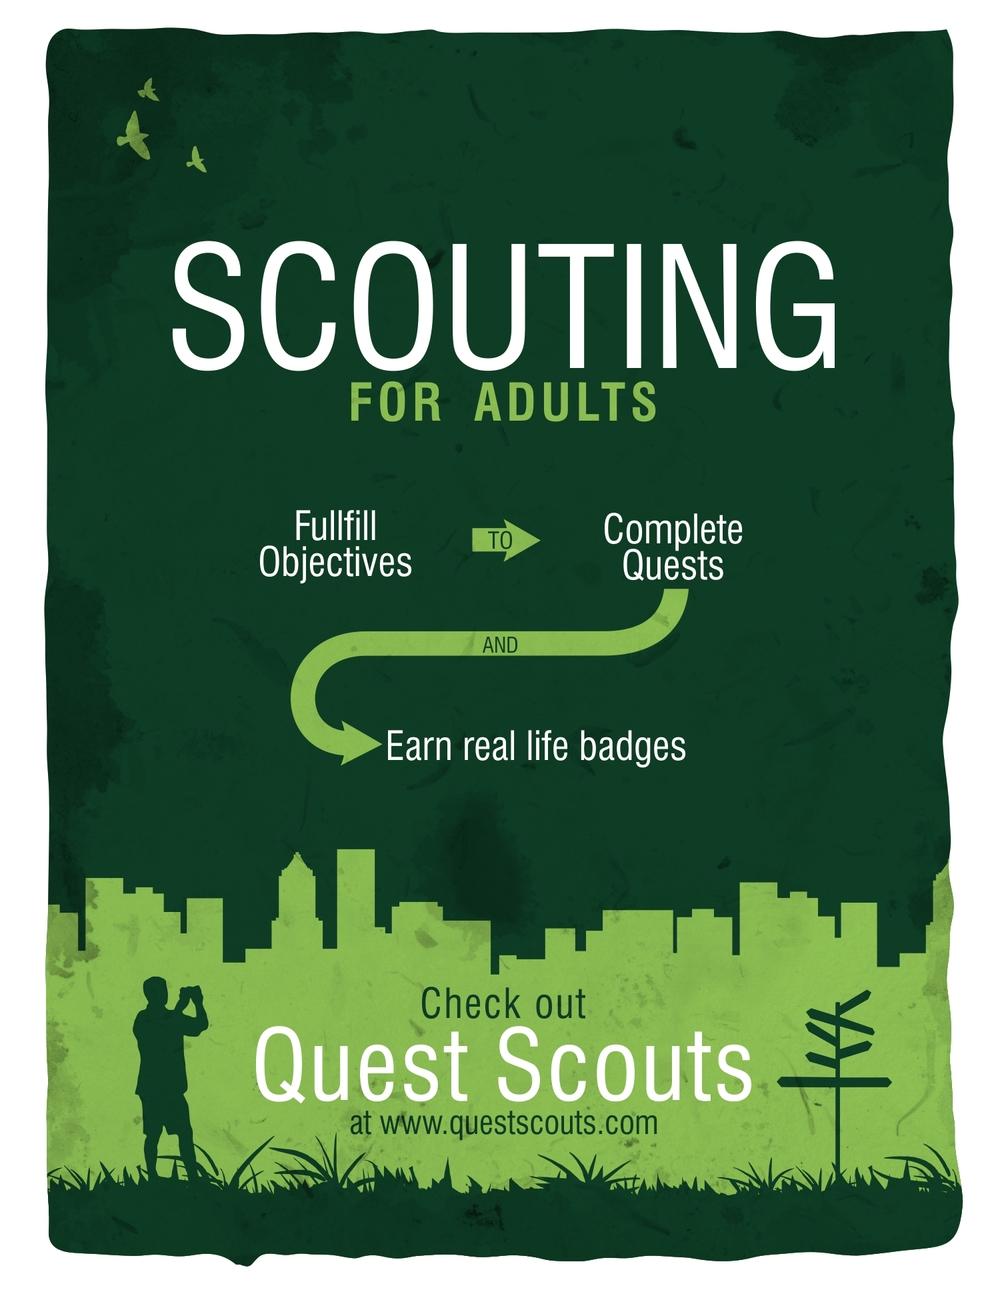 QuestScoutsDiagram.jpg